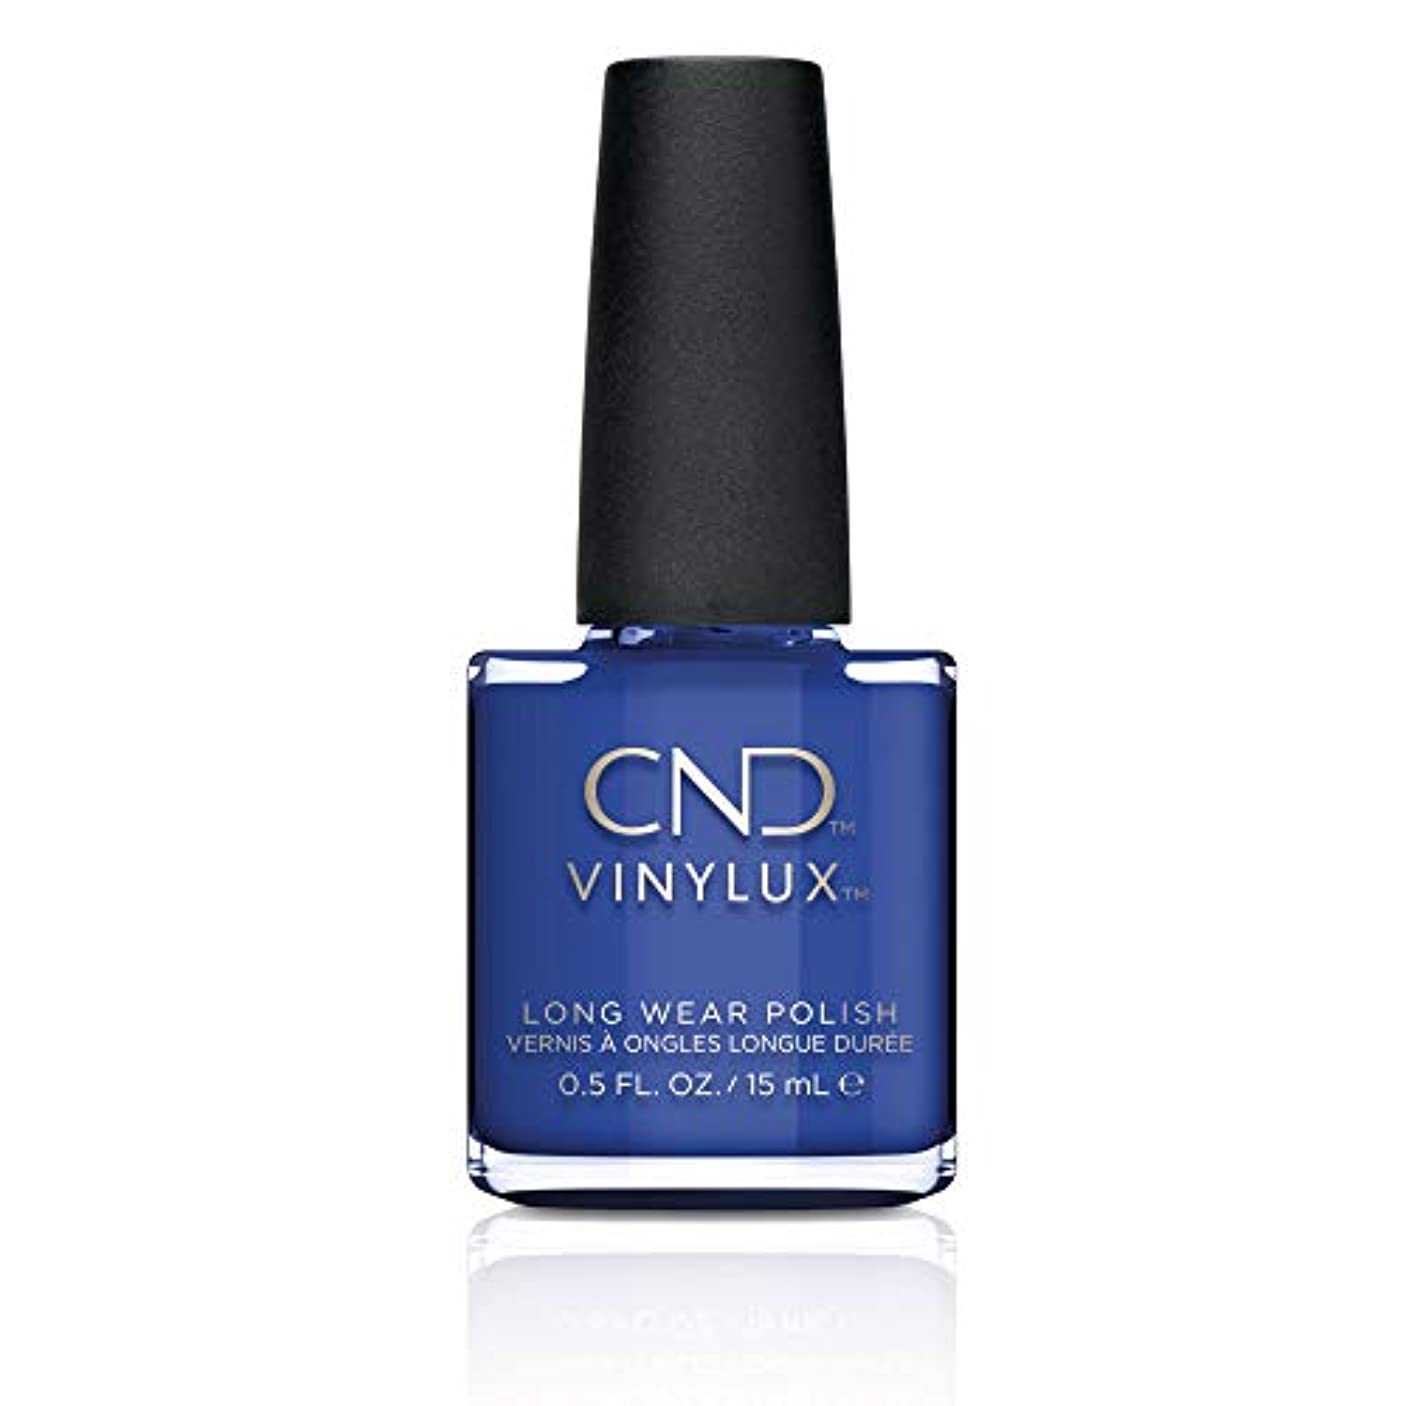 CND(シーエヌディー) バイナラクス ウィークリーポリッシュ 238 ブルーアイシャドウ 15ml